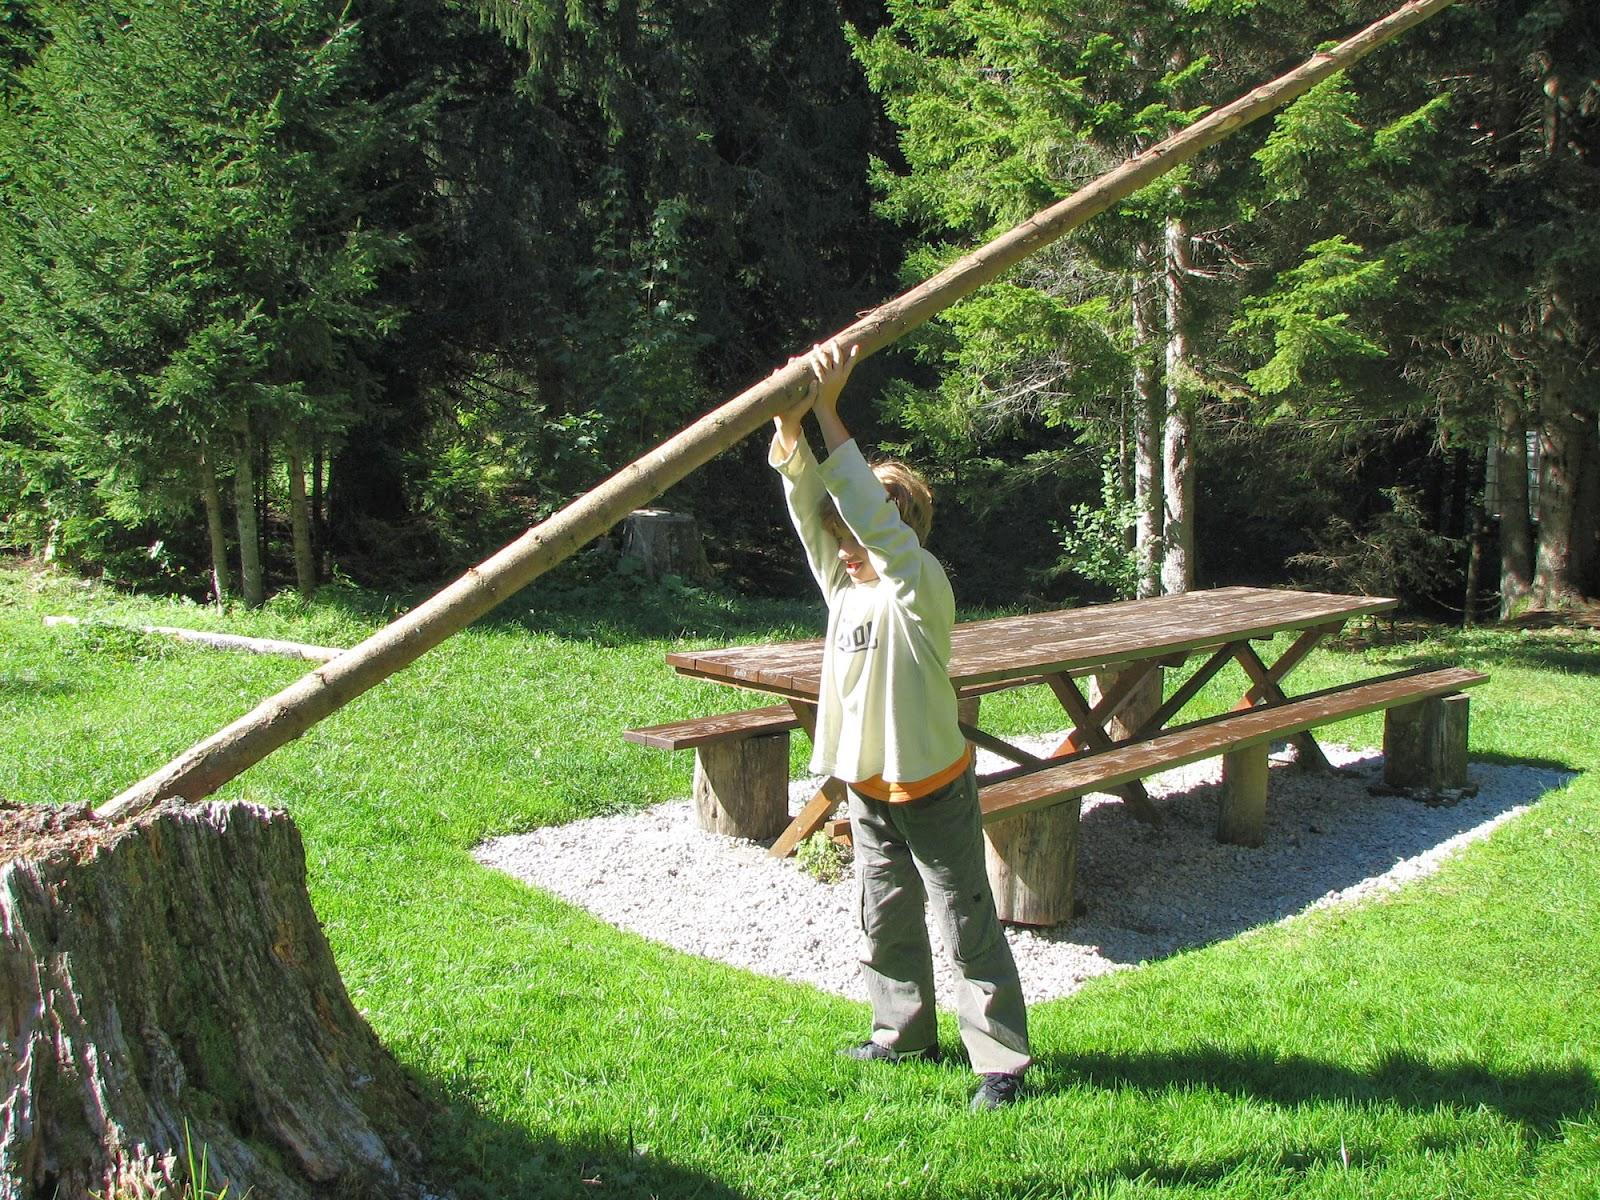 Vodov izlet, Ilirska Bistrica 2005 - Picture%2B126.jpg